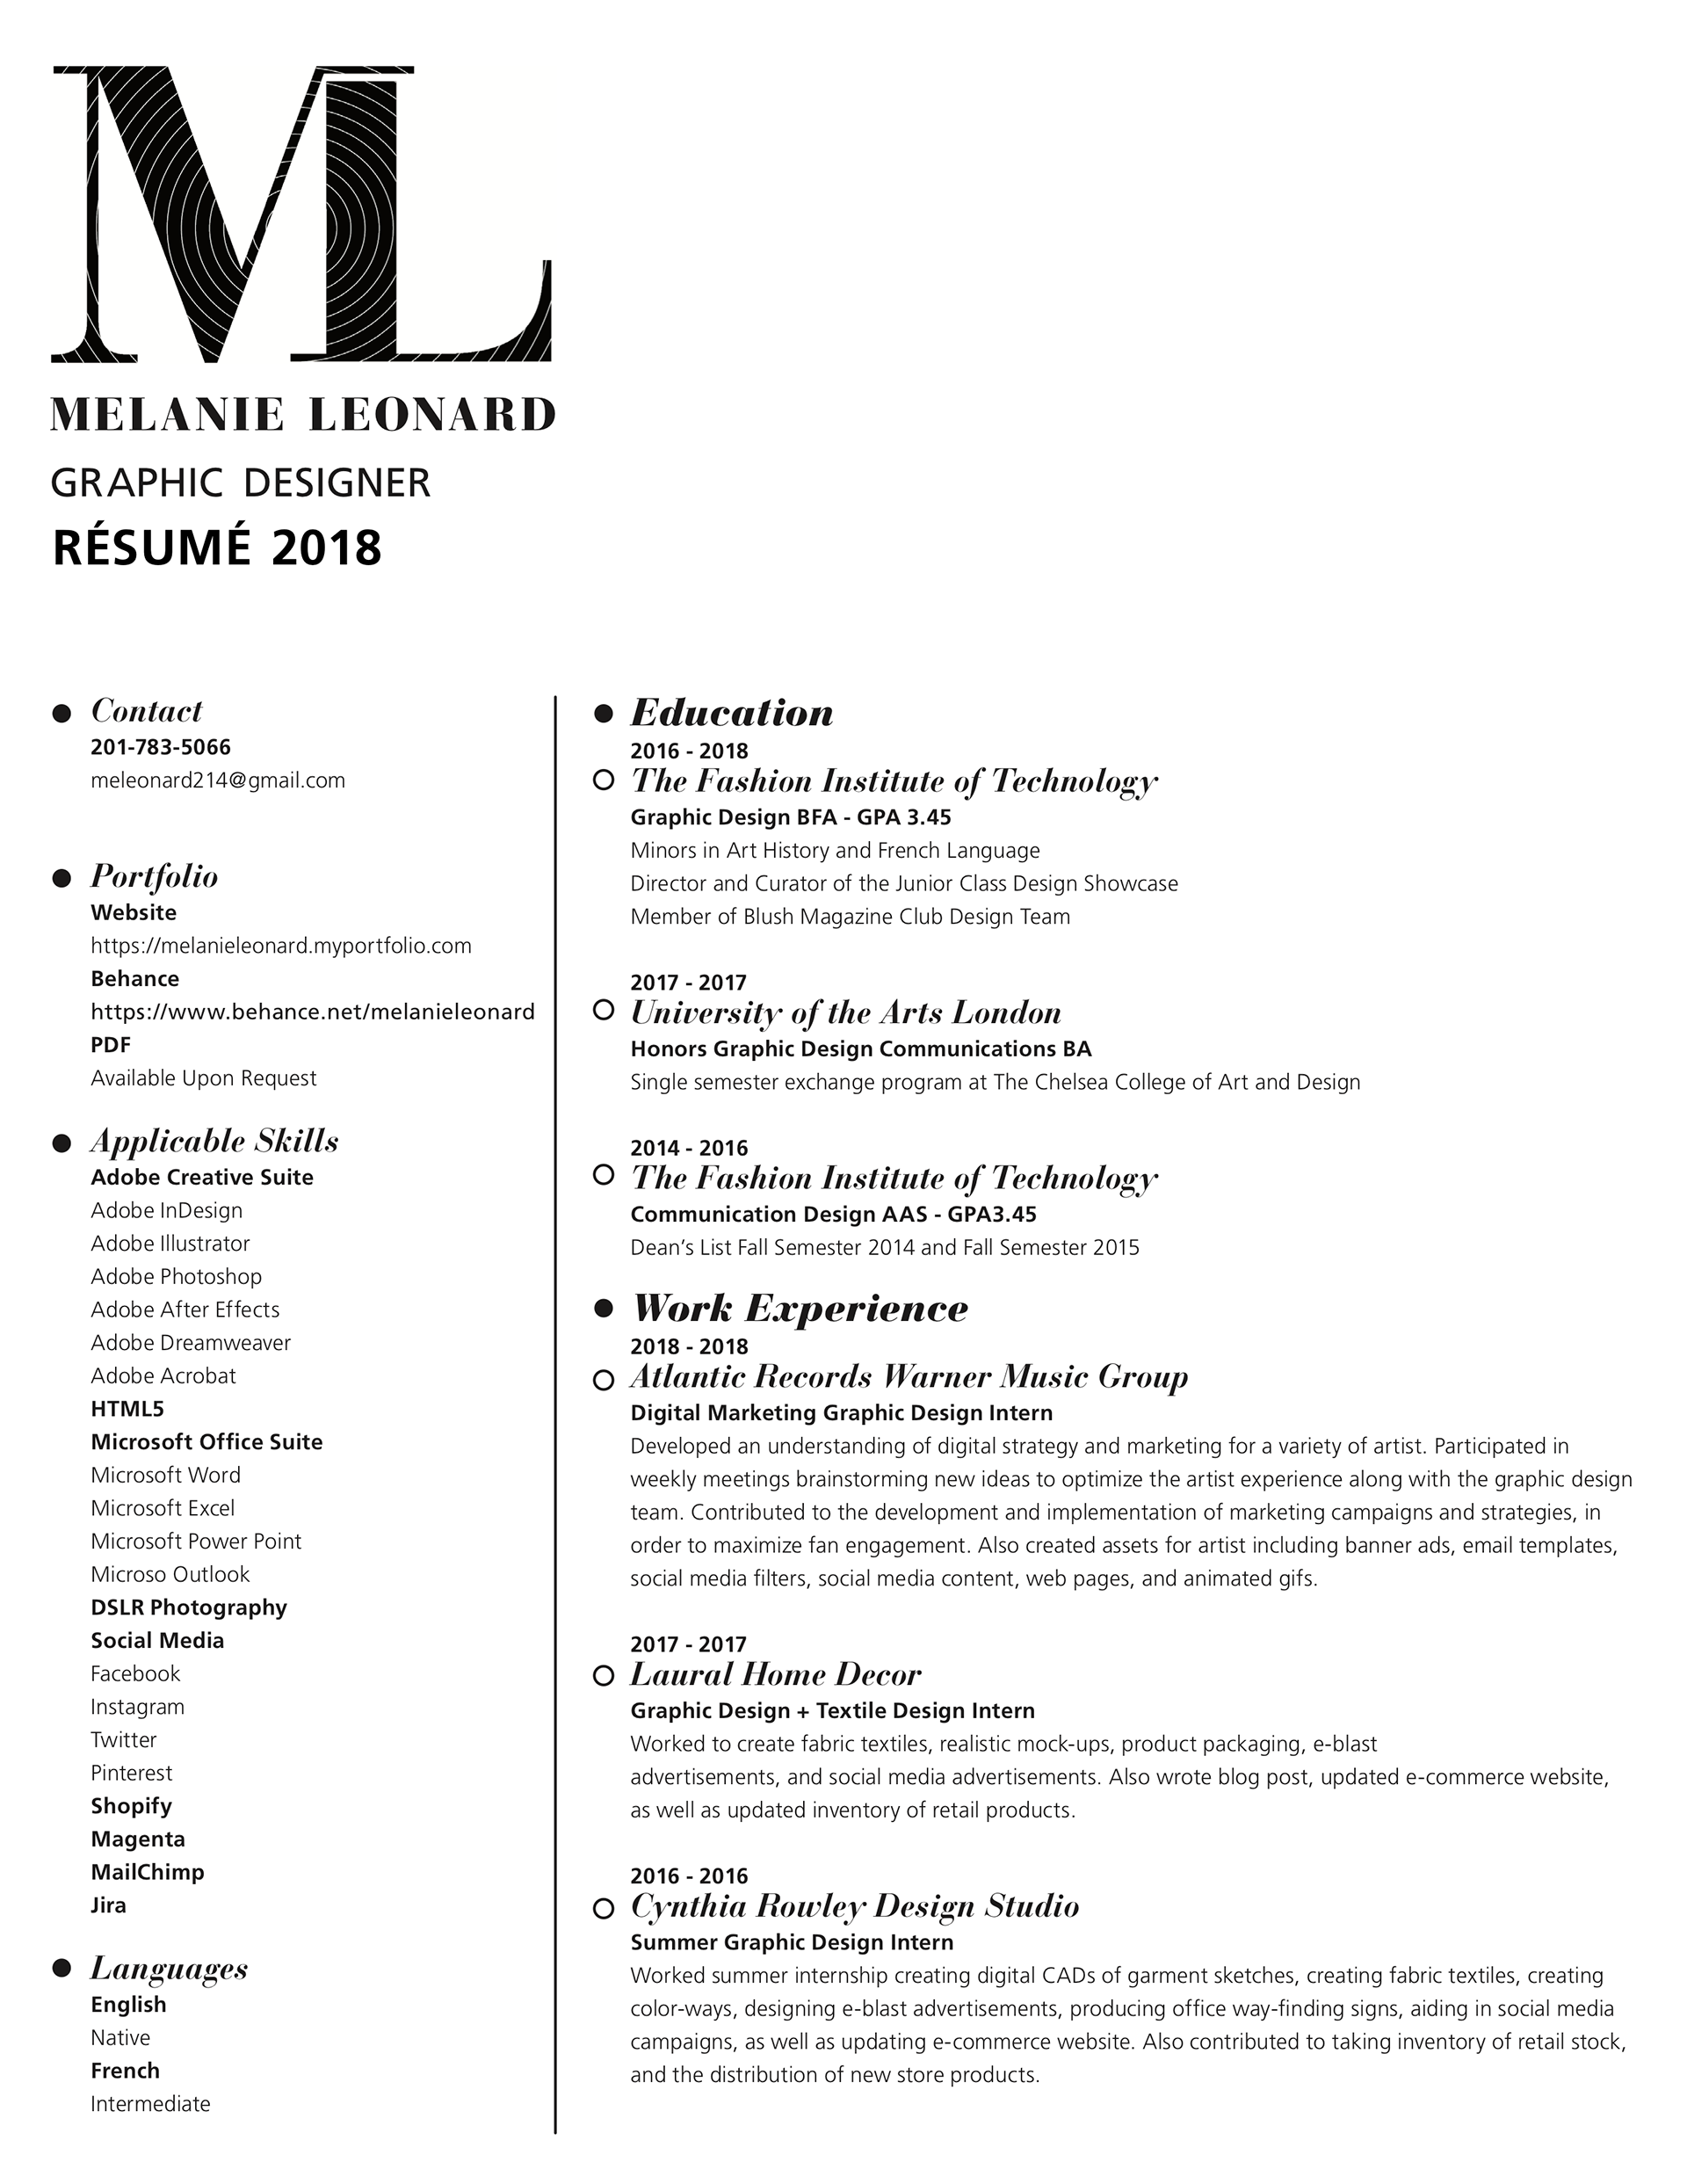 Melanie Leonard Resume